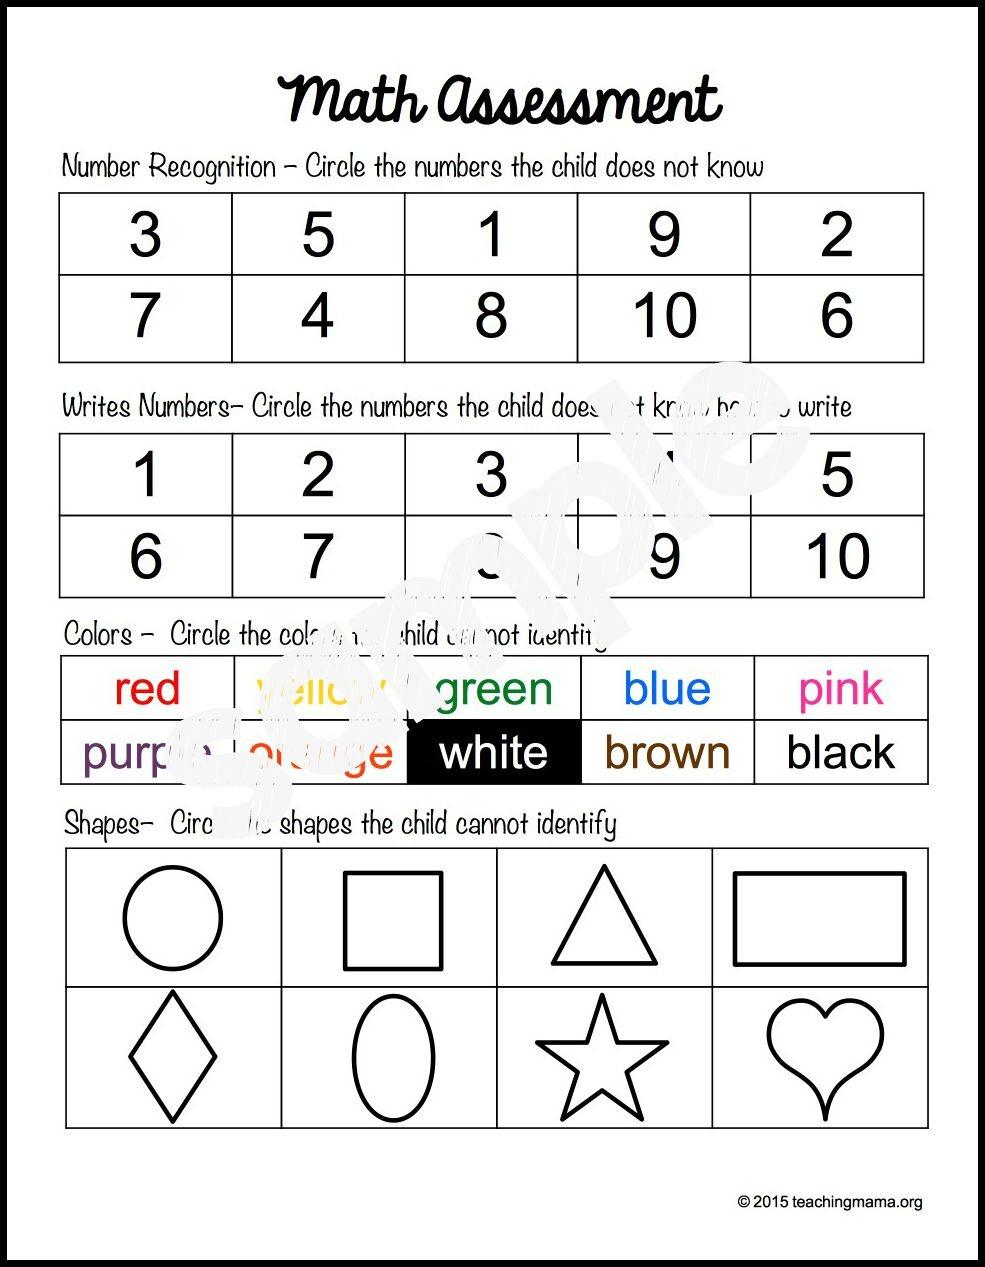 Preschool Assessment Forms - Teaching Mama - Free Printable Pre K Assessment Forms